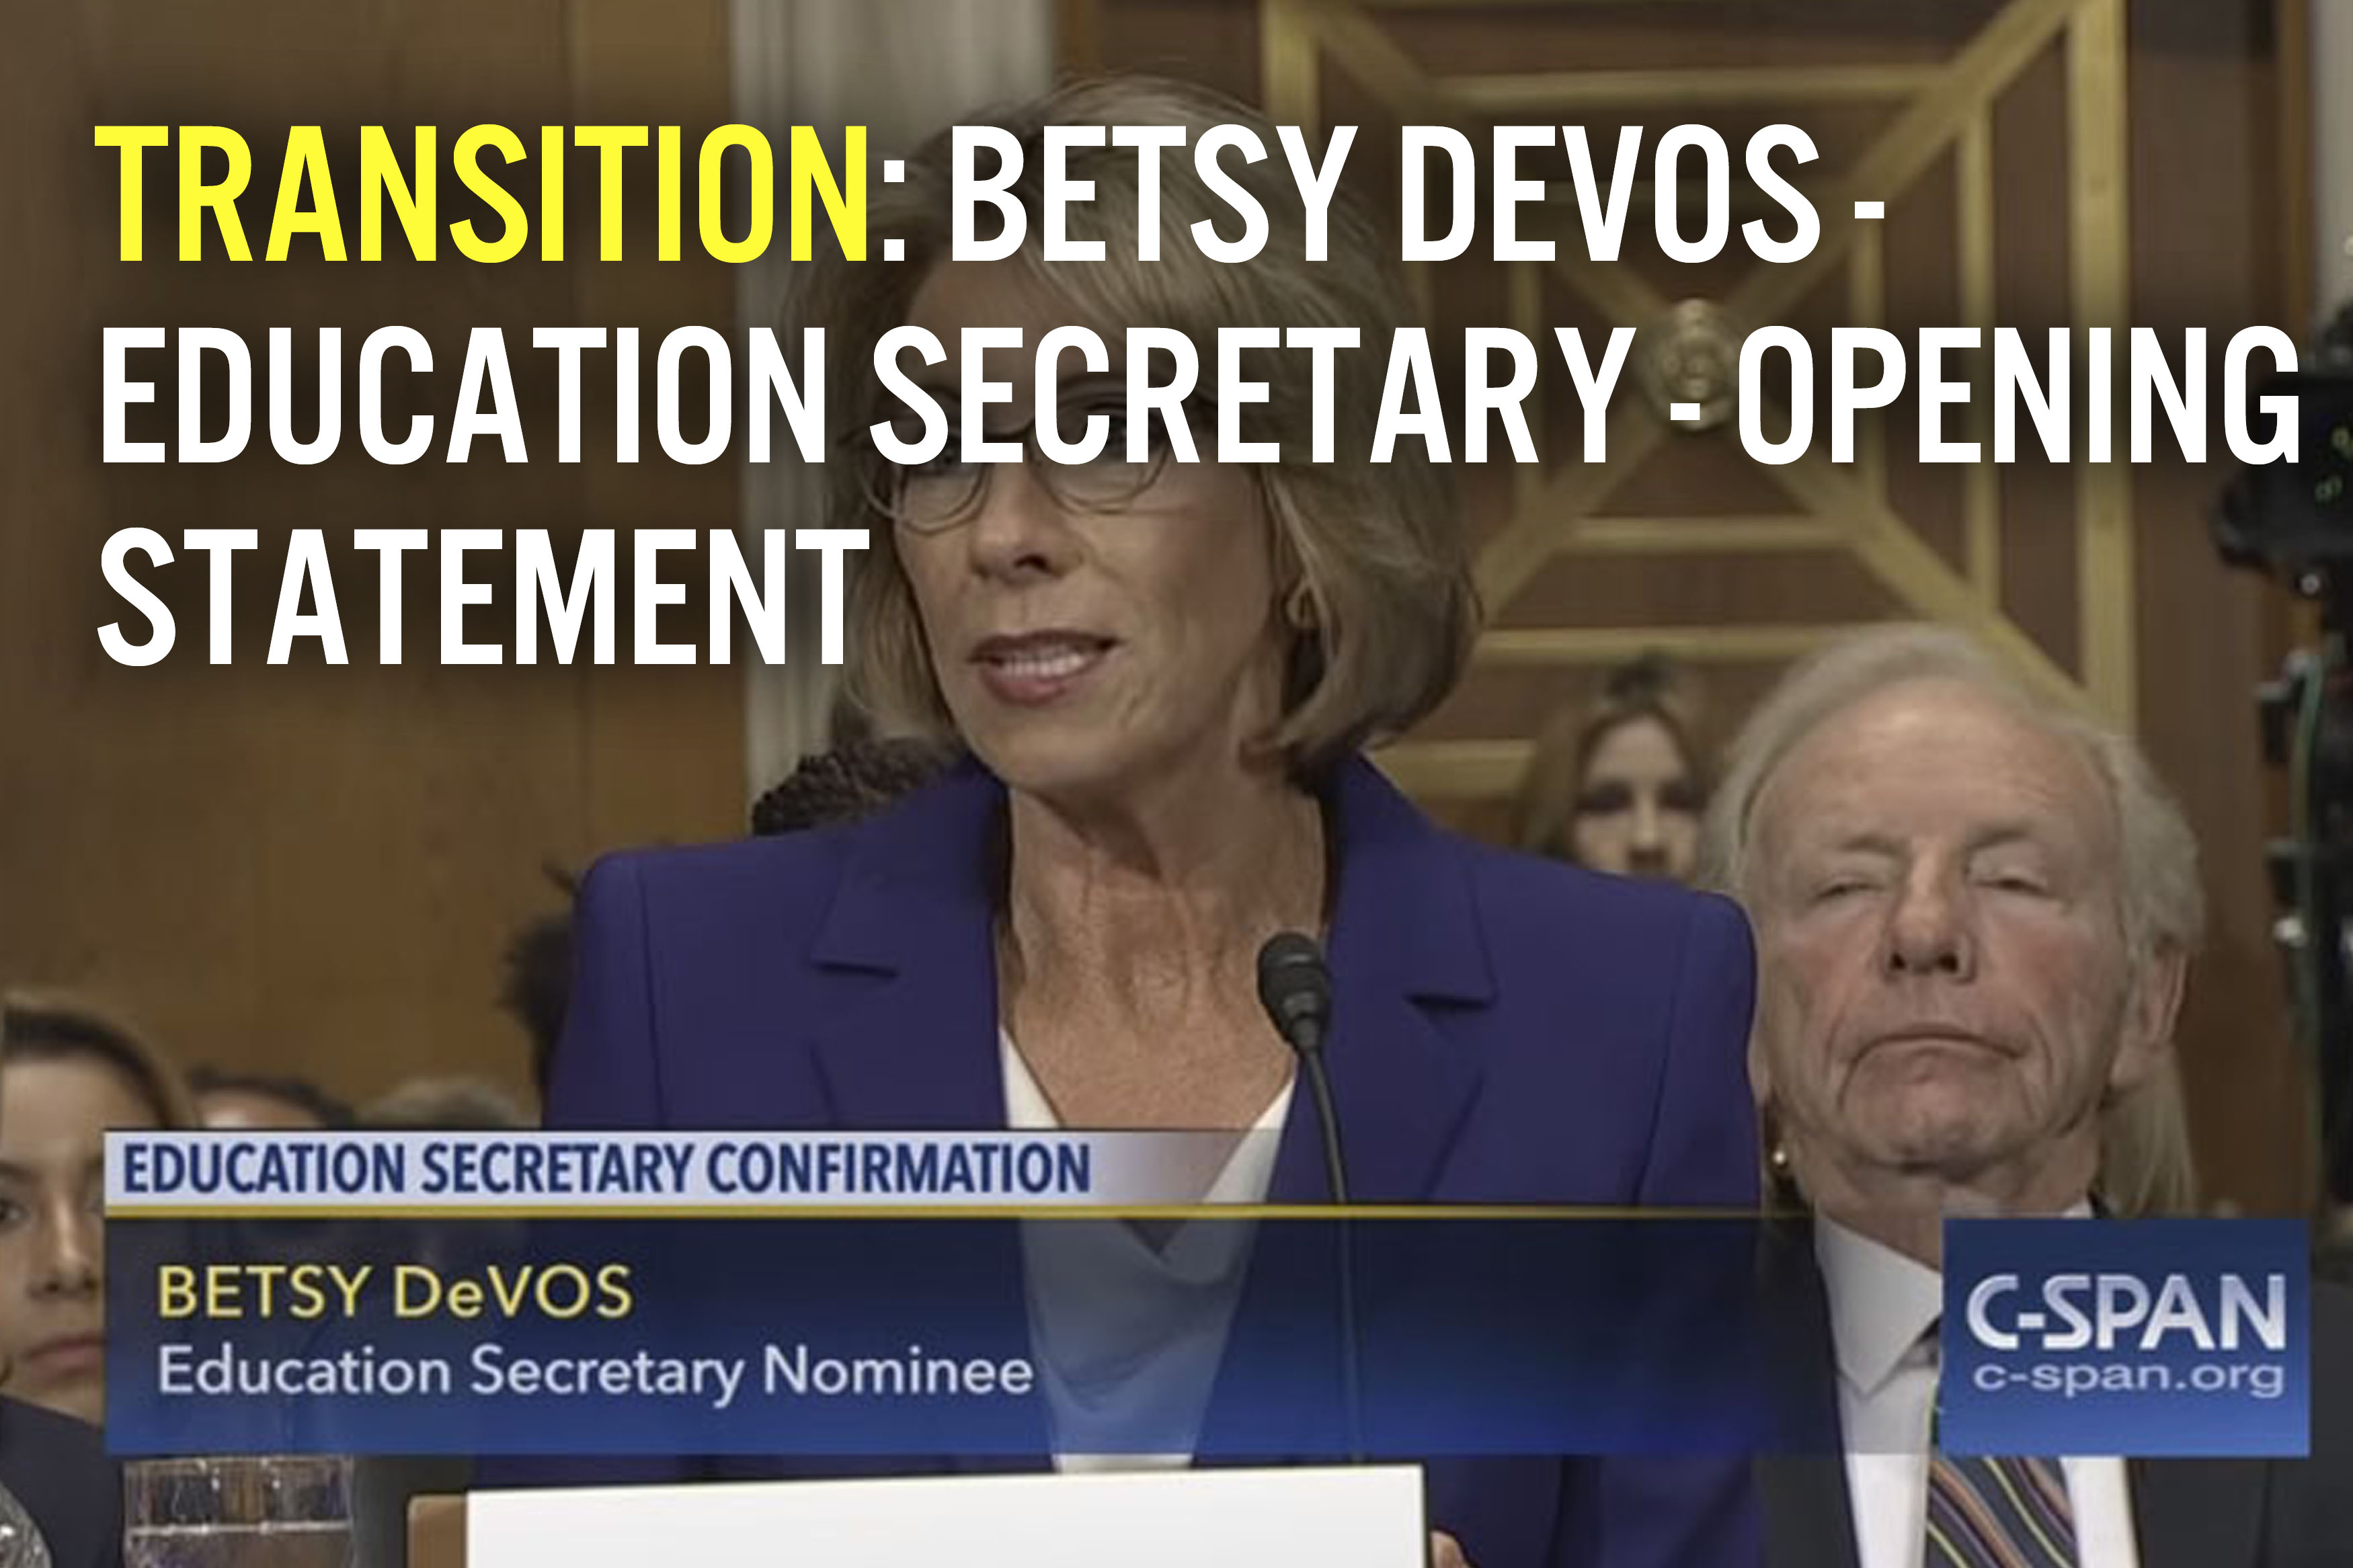 Betsy Duvos